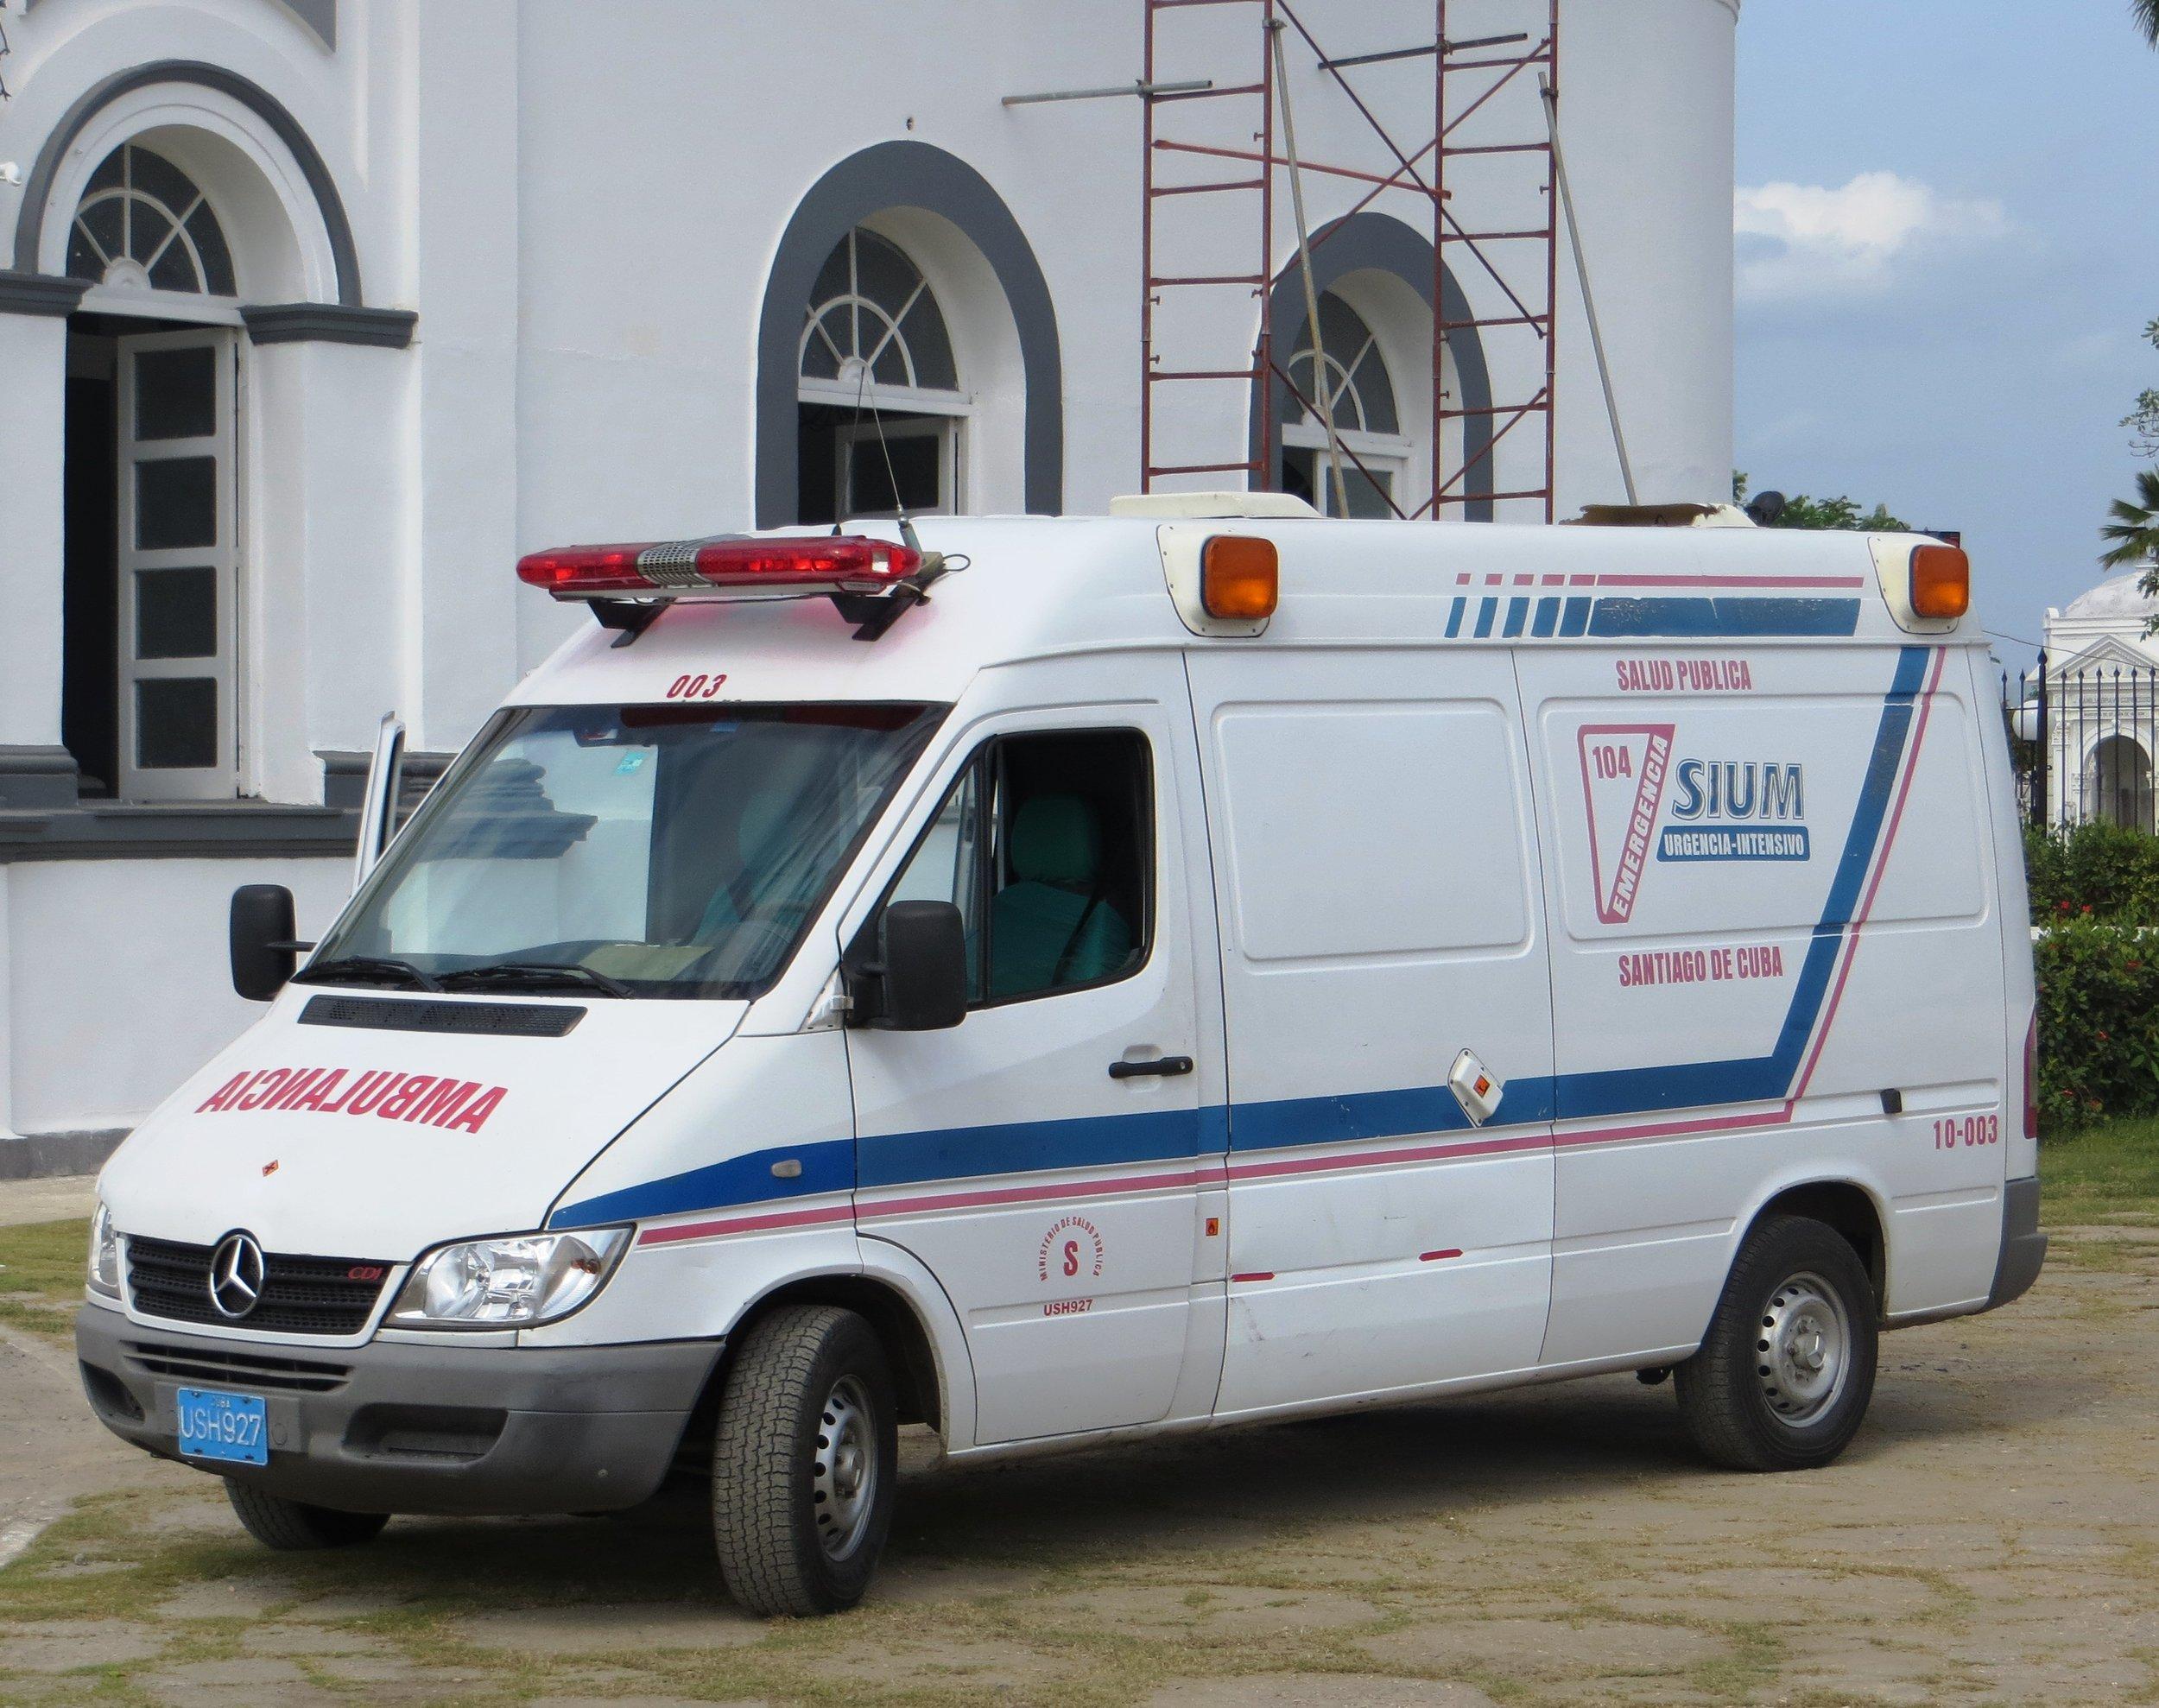 Cuba_ambulance.JPG